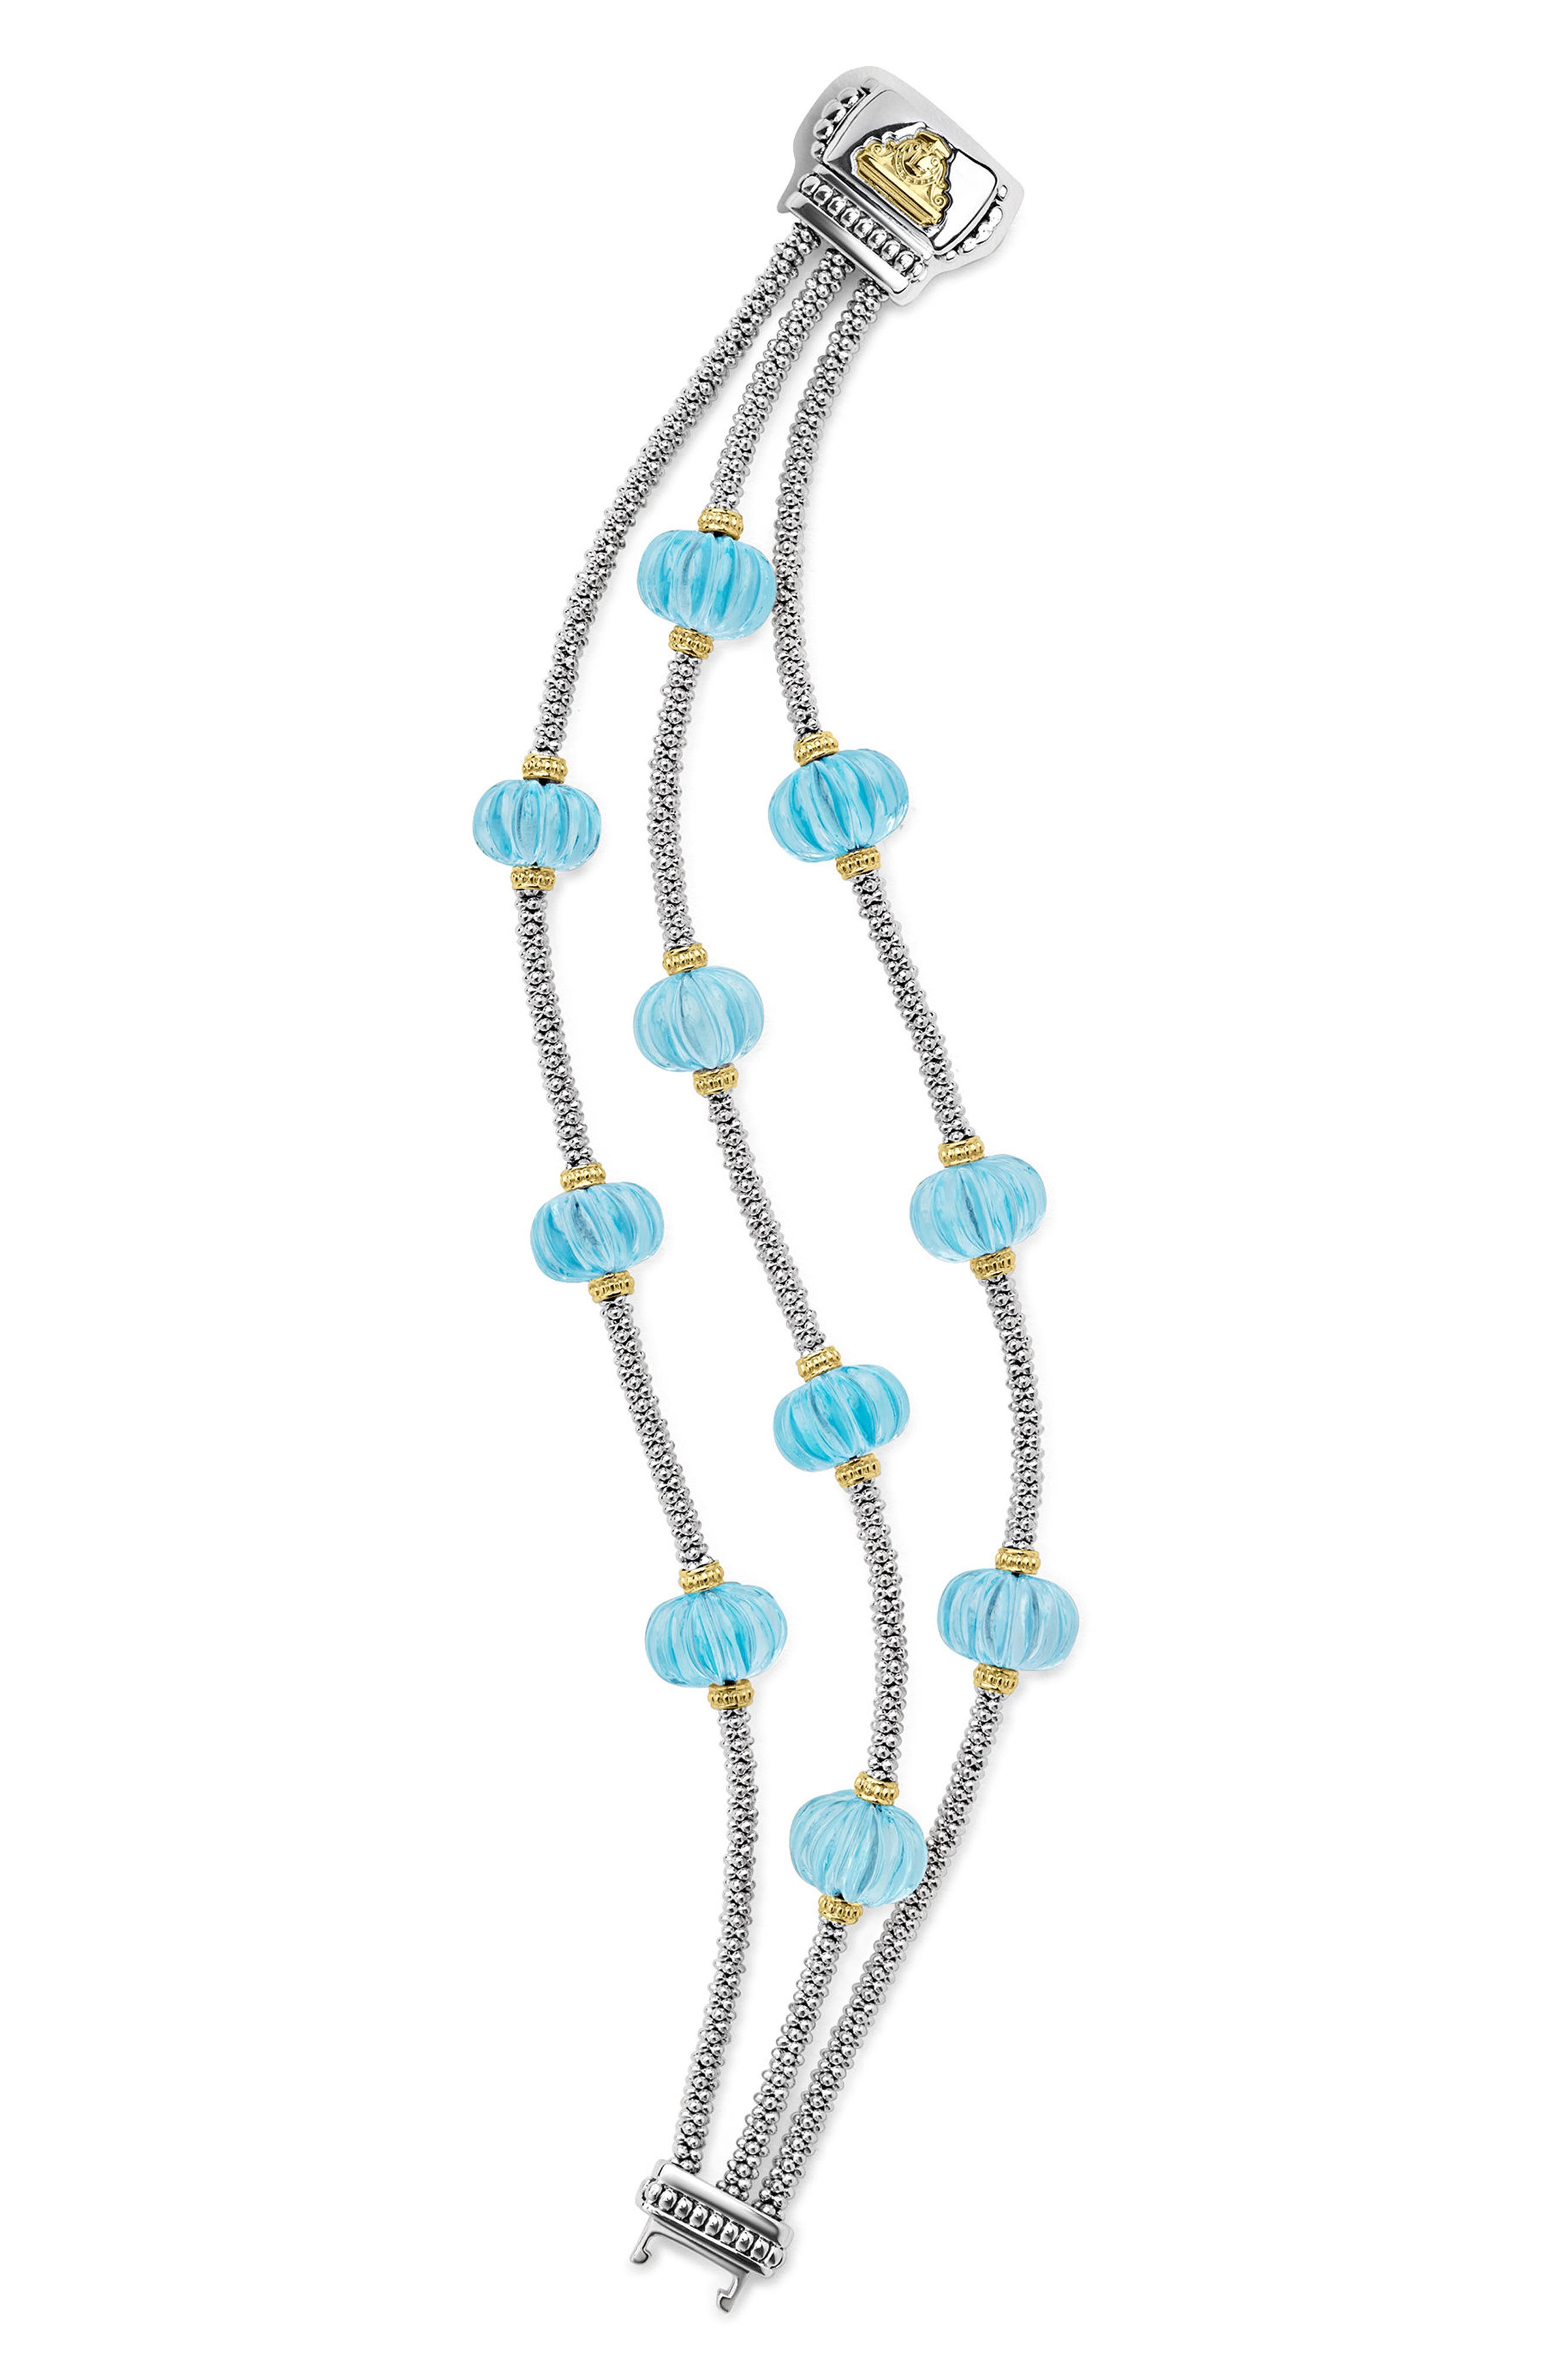 Caviar Forever Triple Strand Melon Bead Bracelet,                             Alternate thumbnail 3, color,                             Silver/ Sky Blue Topaz